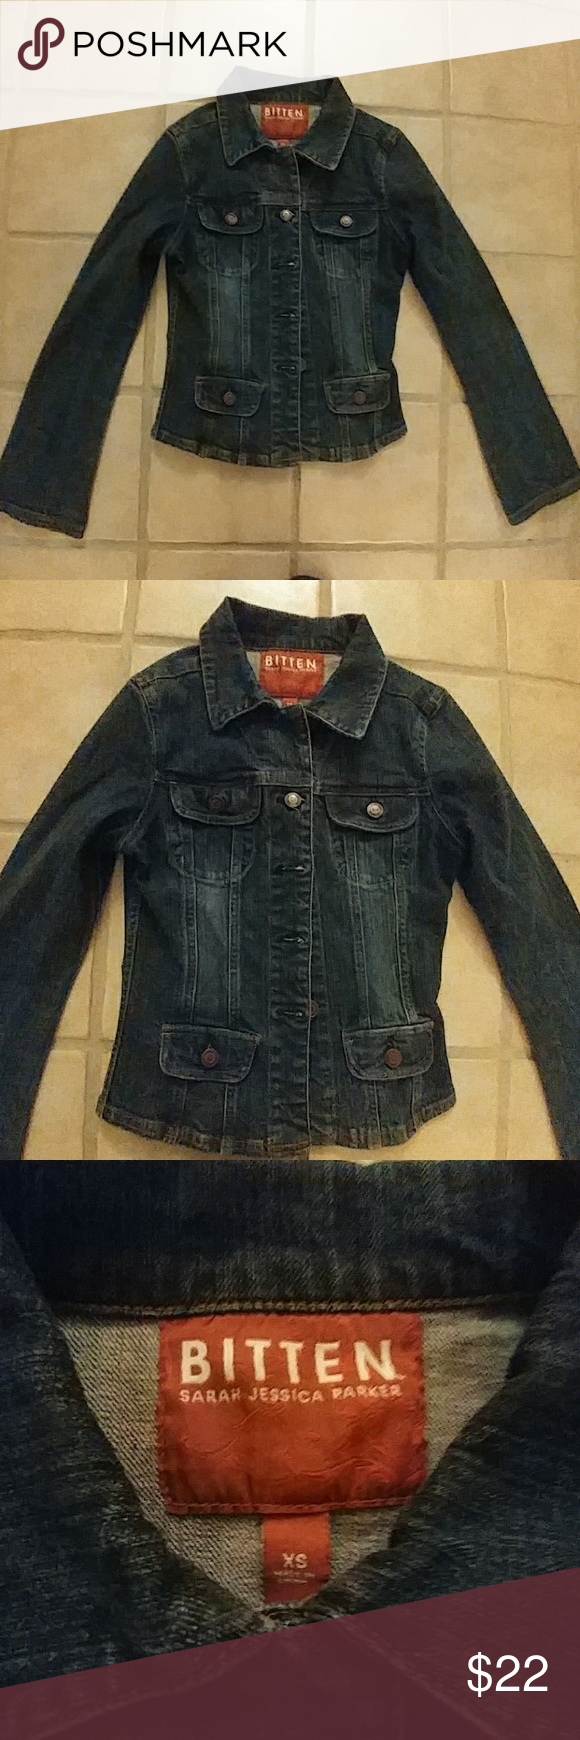 Sarah Jessica Parker Jean Jacket Bitten by SJP Denim Jacket. Broken In. Pre loved! Fitted. Cool Jacket! Jackets & Coats Jean Jackets